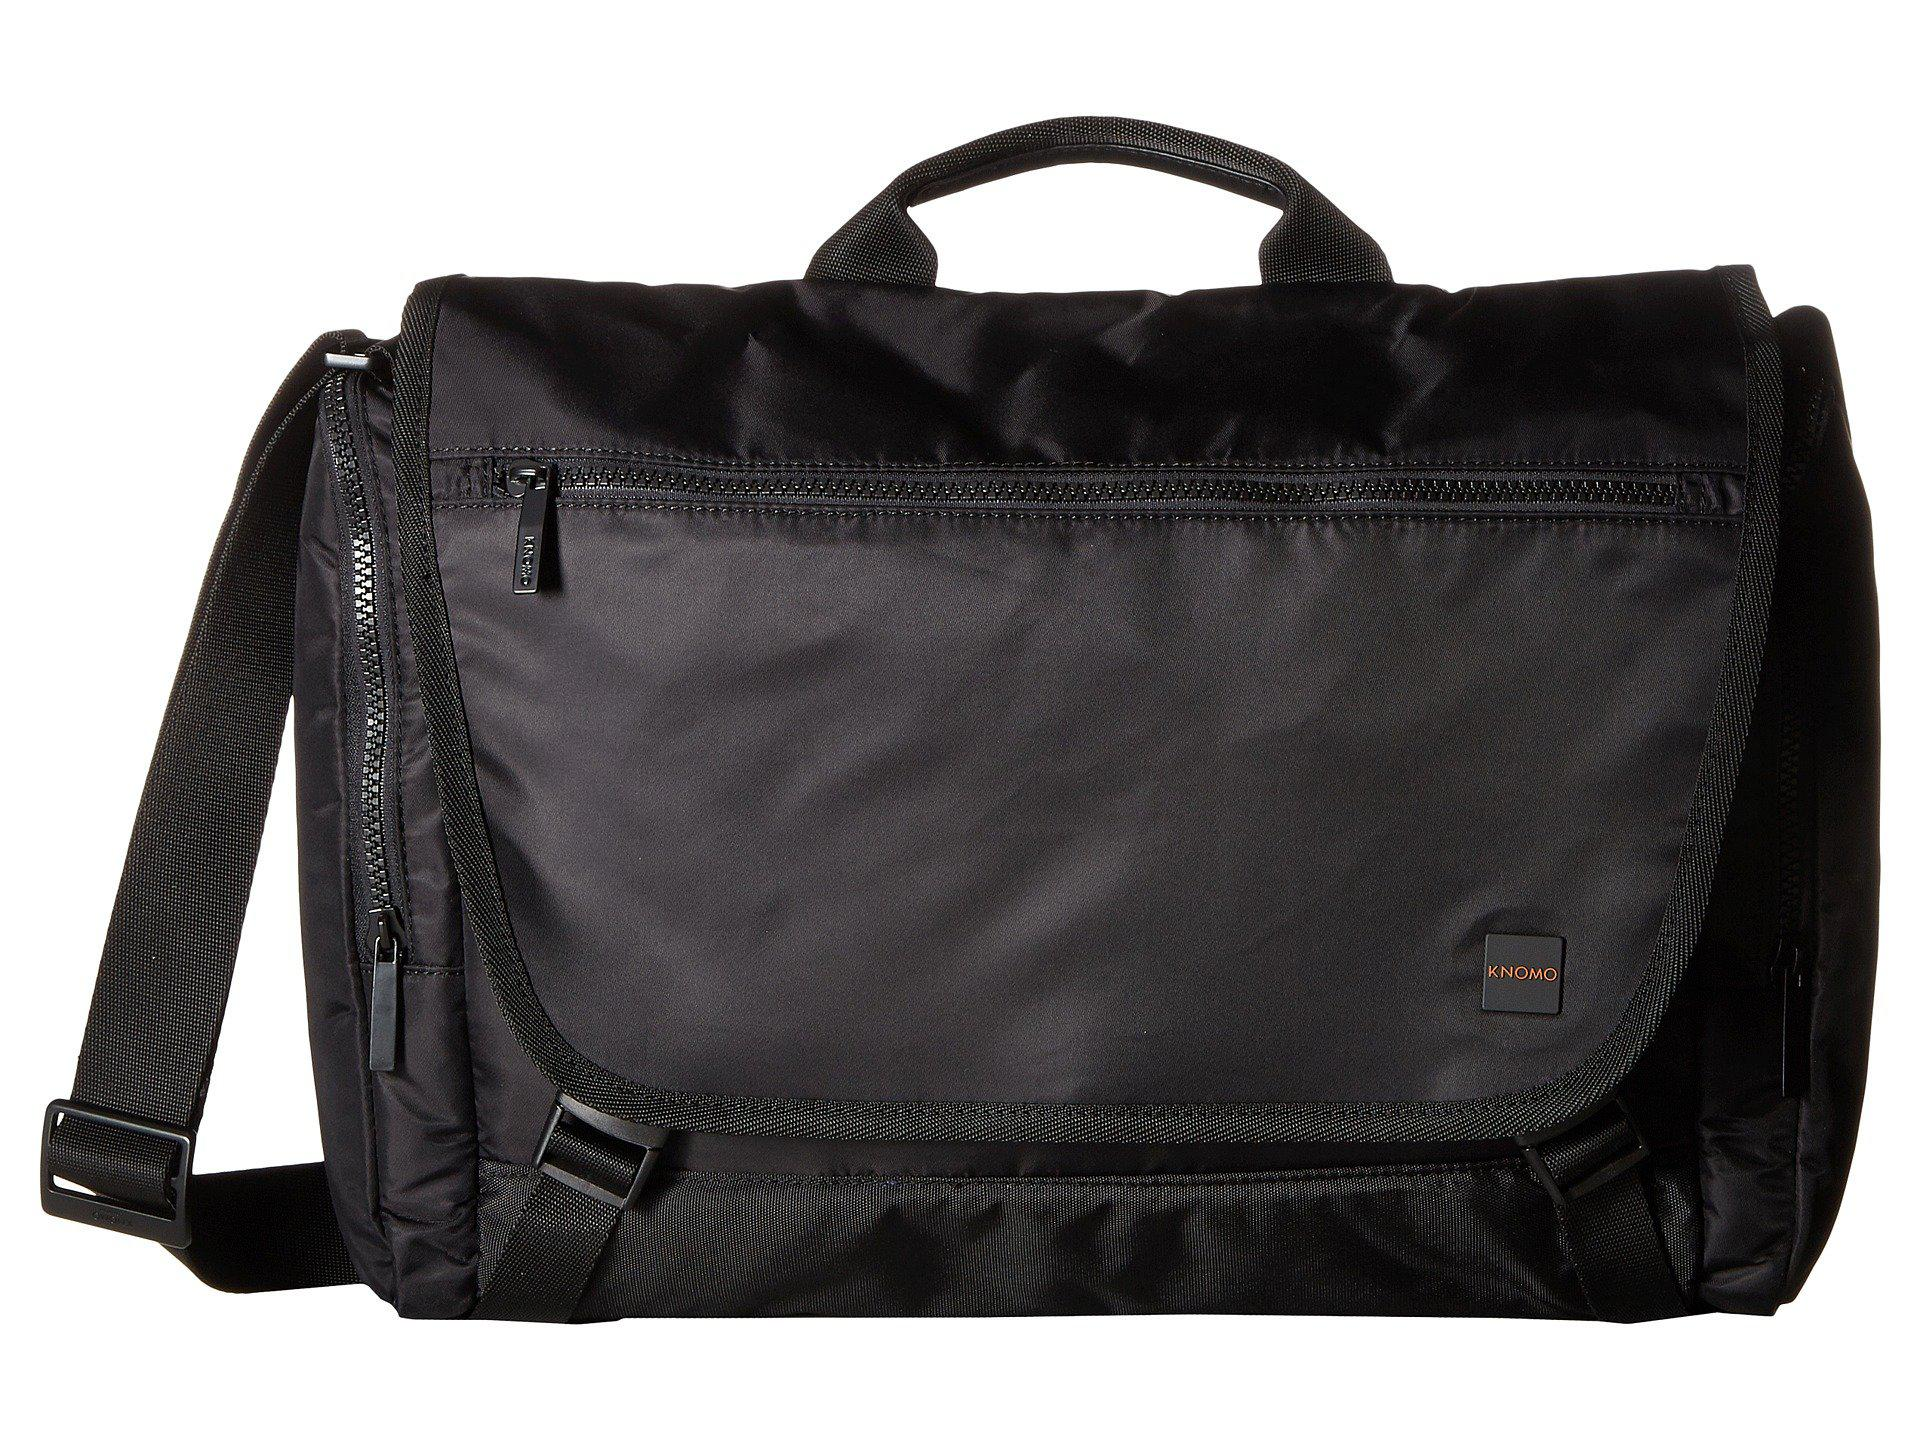 Knomo Pimlico Hugh Laptop Messenger (Black) Messenger Bags HBNNVH